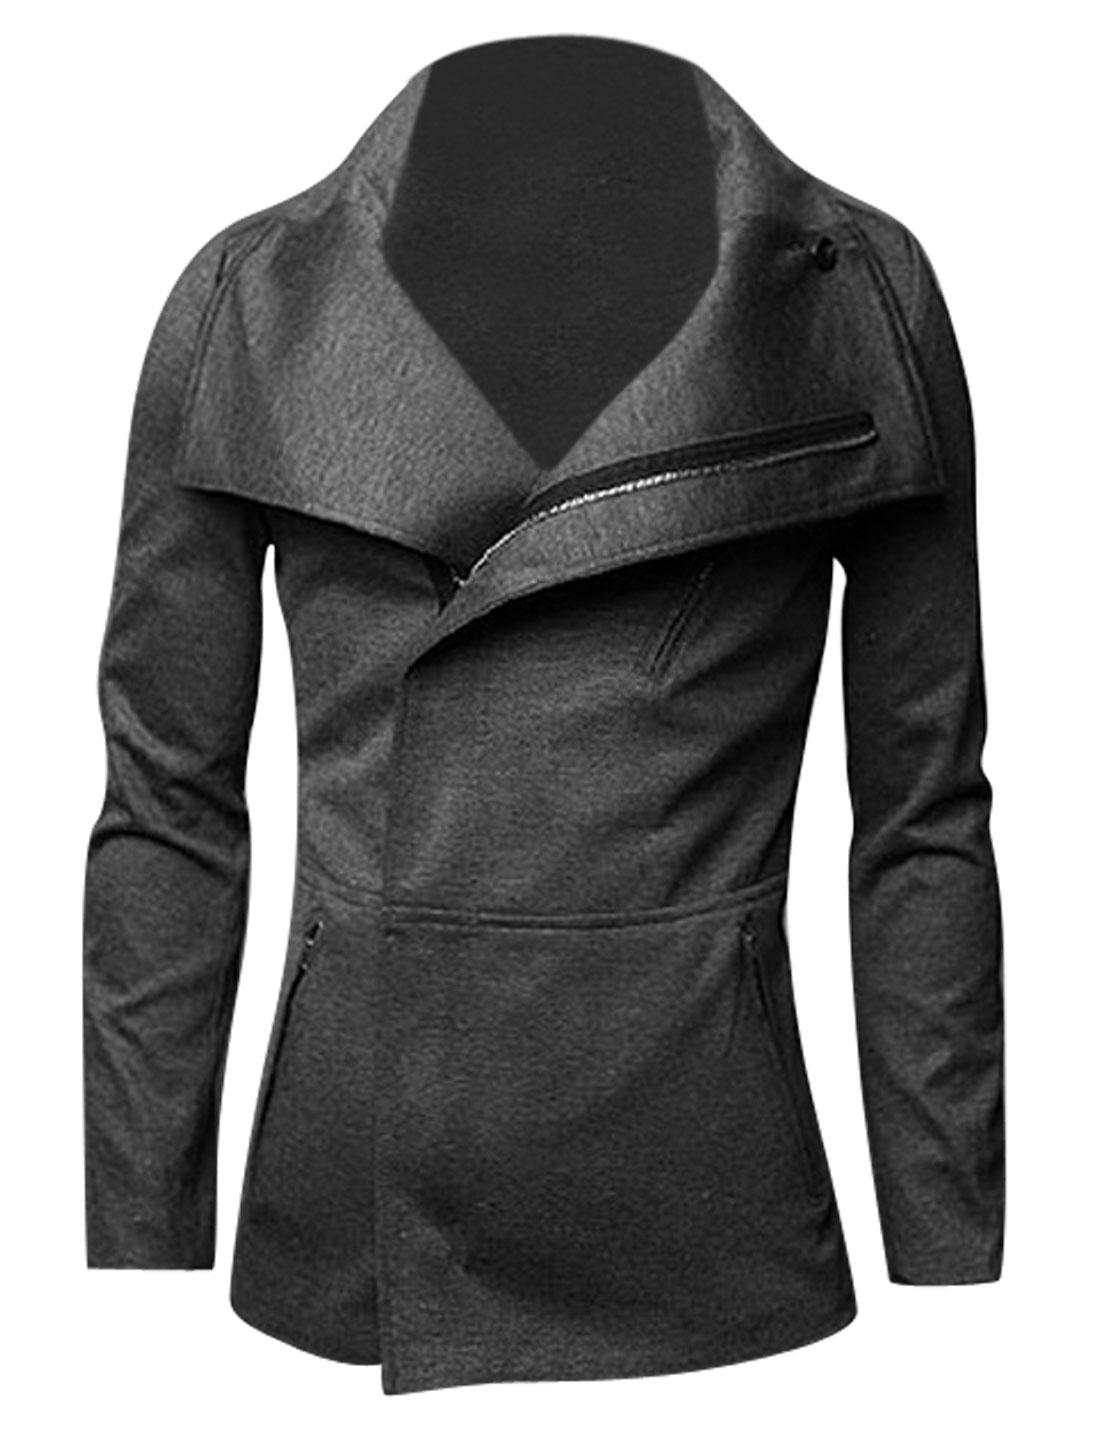 Men Convertible Collar Two Zipper Pockets Chic Jacket Dark Gray M